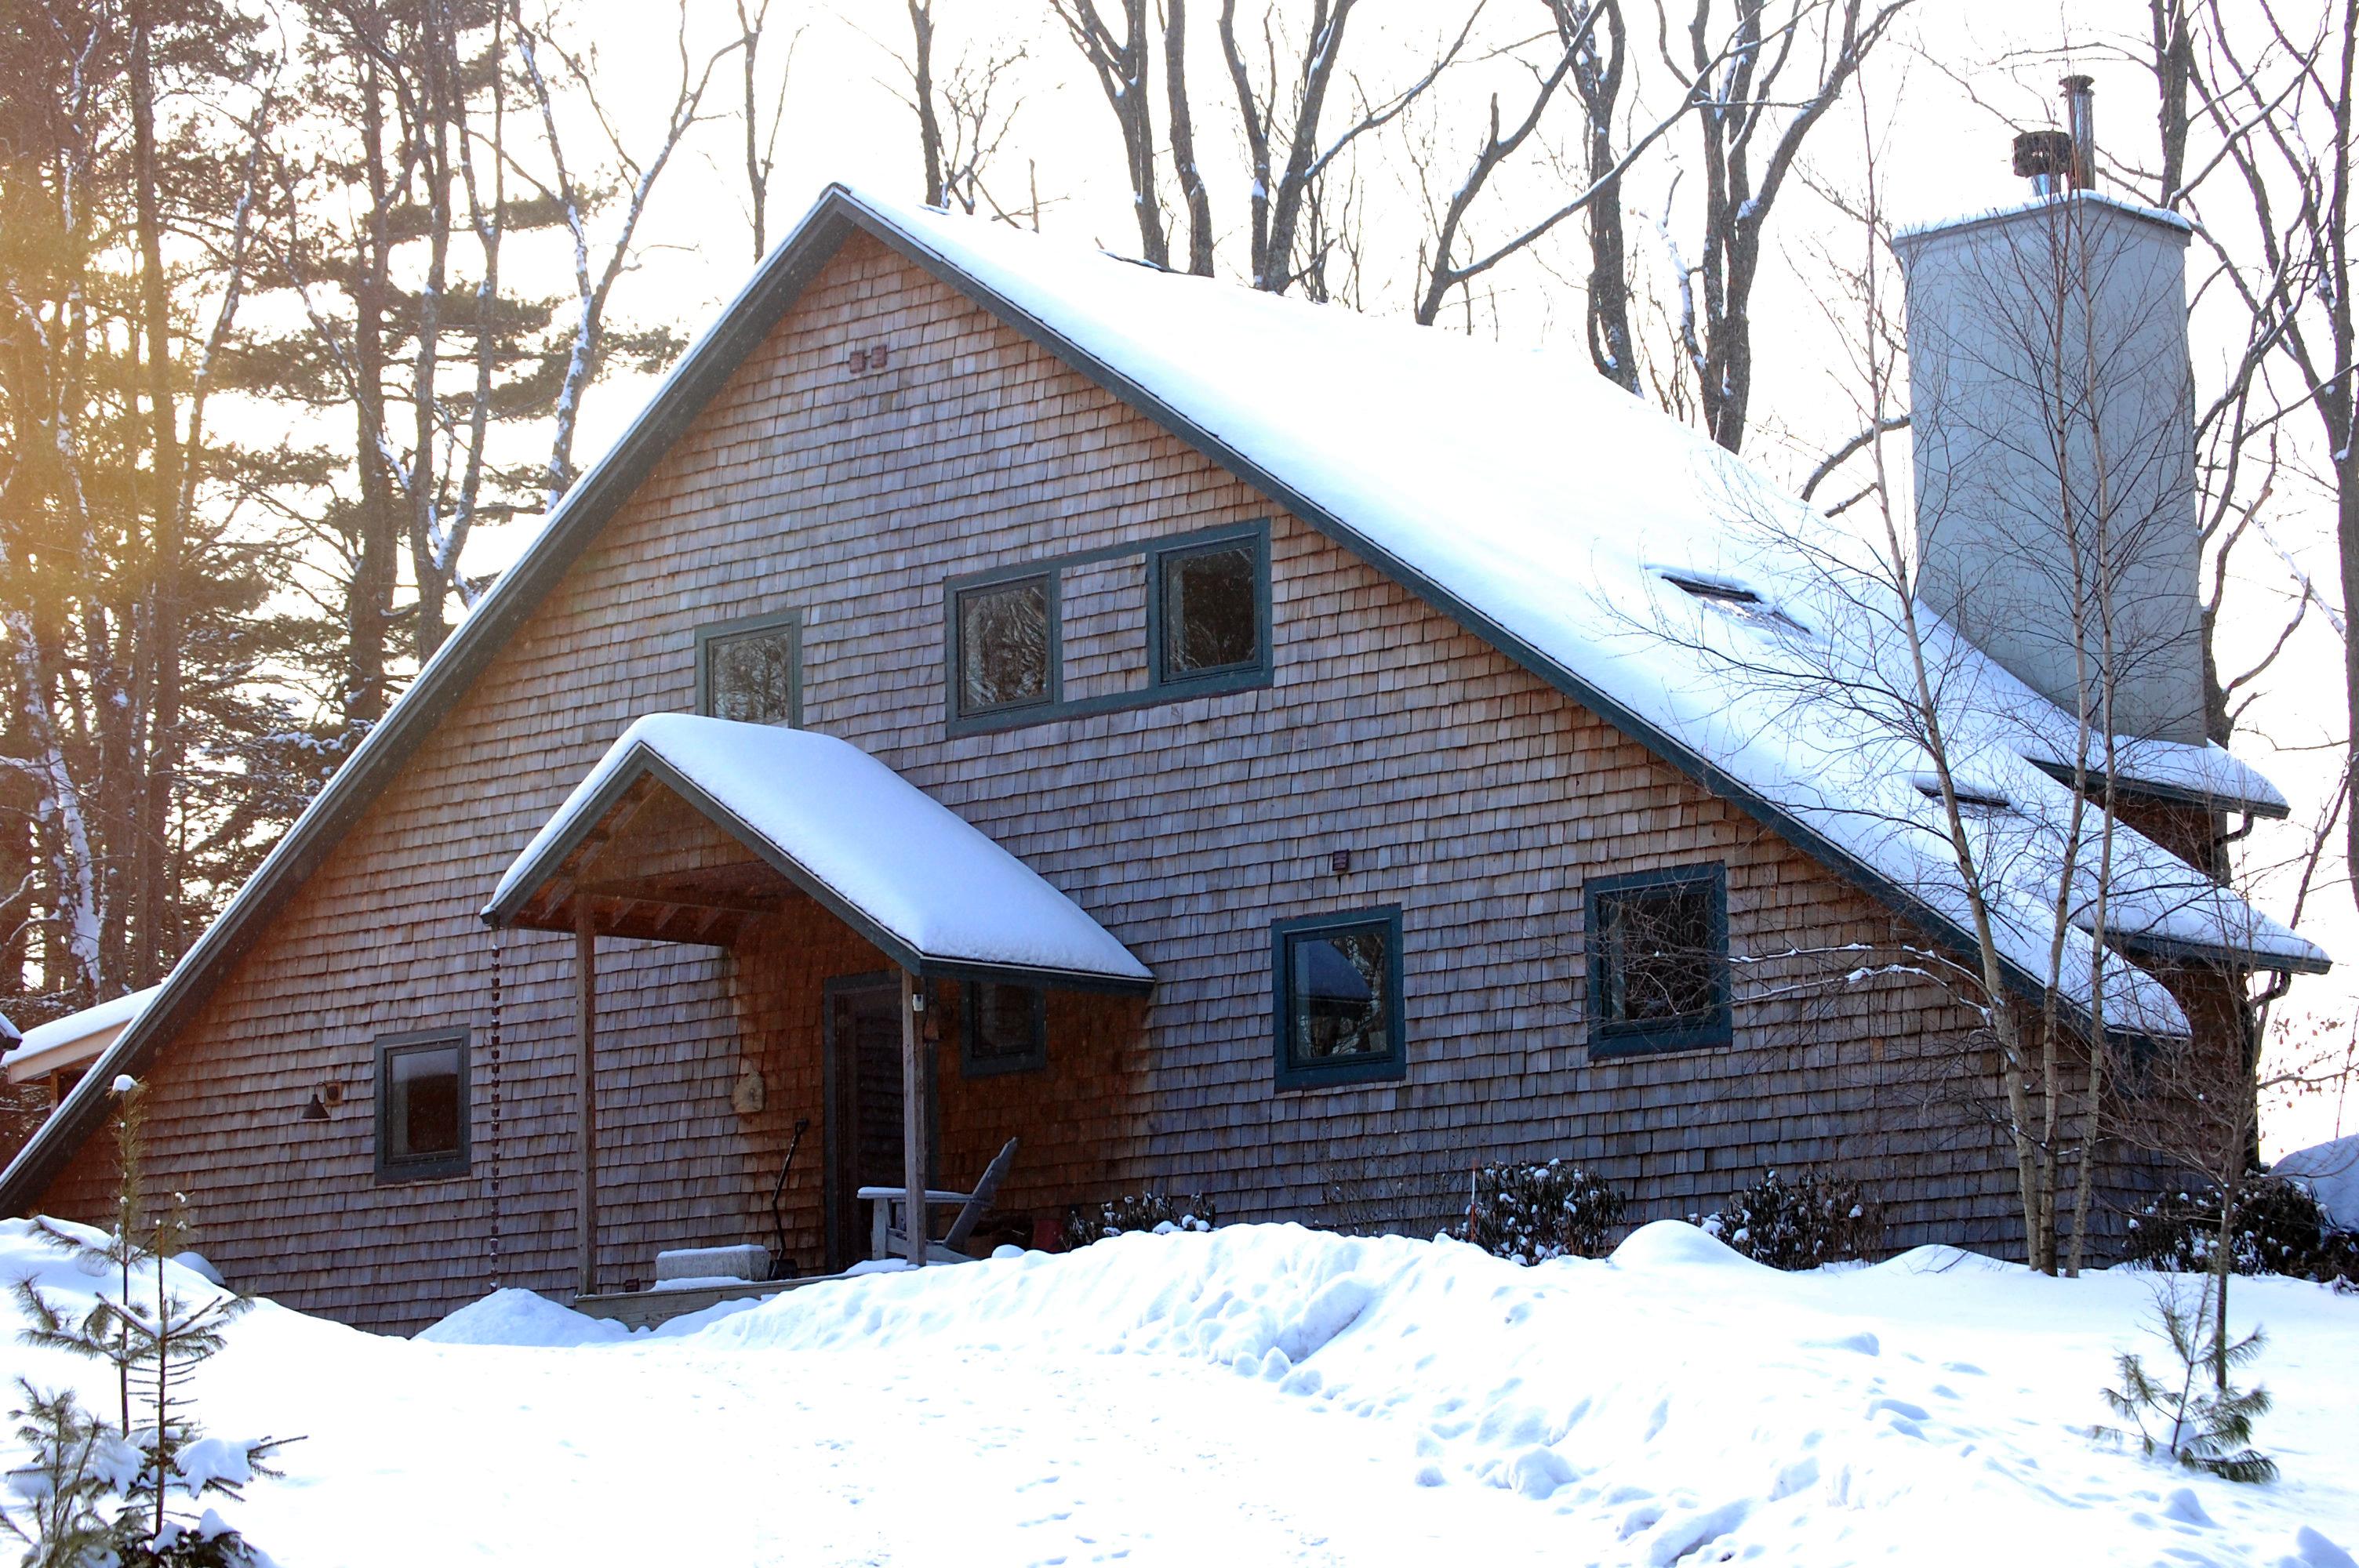 Woodland mountain house